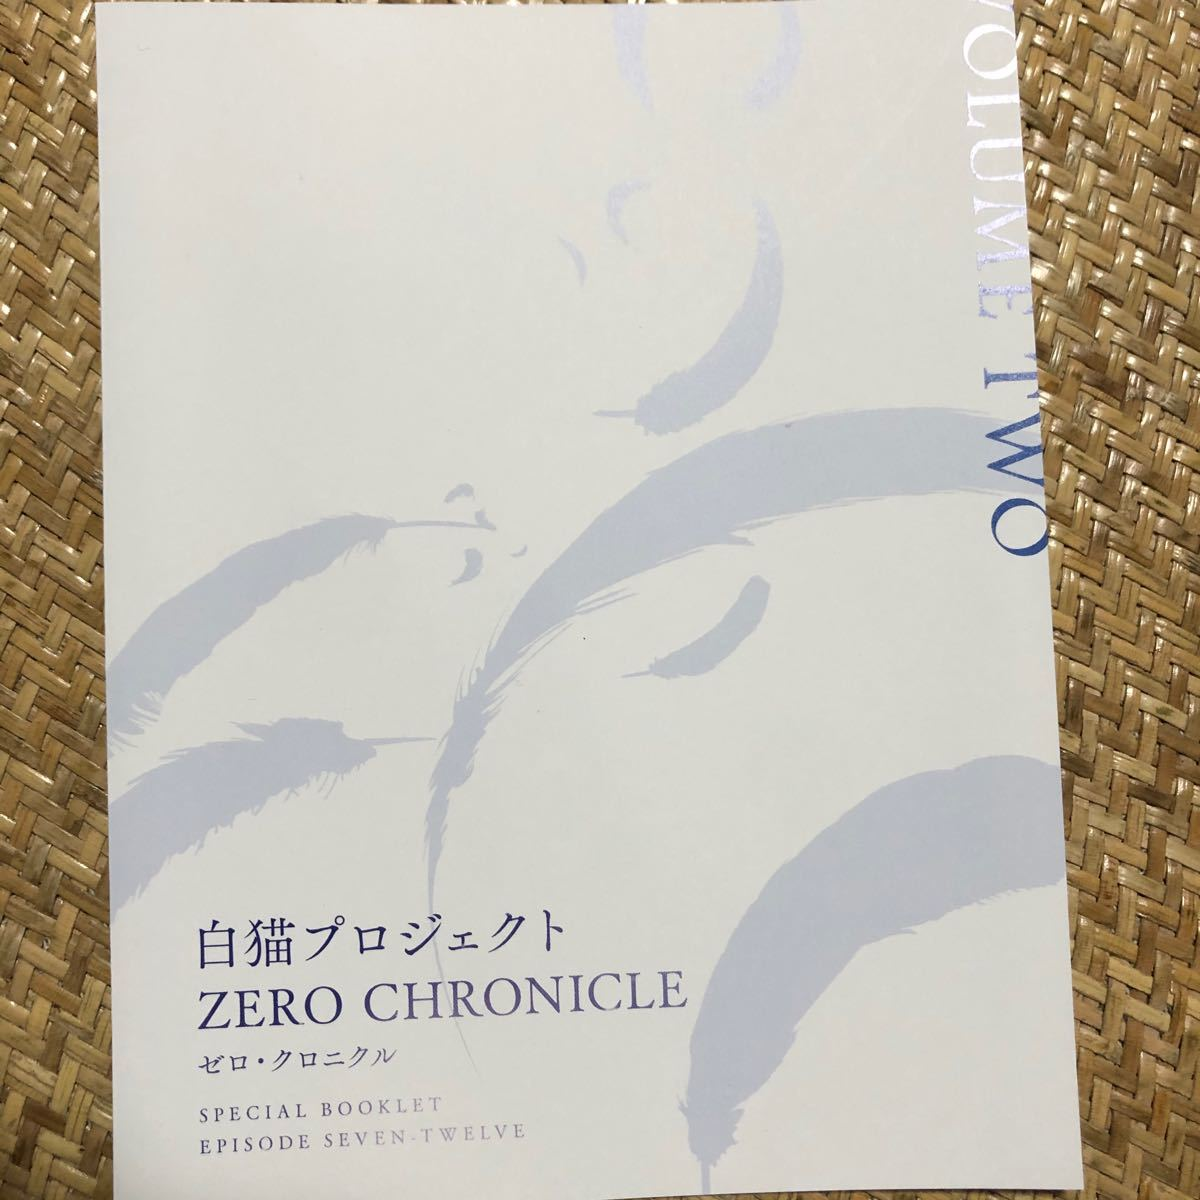 DVD 白猫プロジェクト ZERO CHRONICLE DVD BOX 下巻 [KADOKAWA]